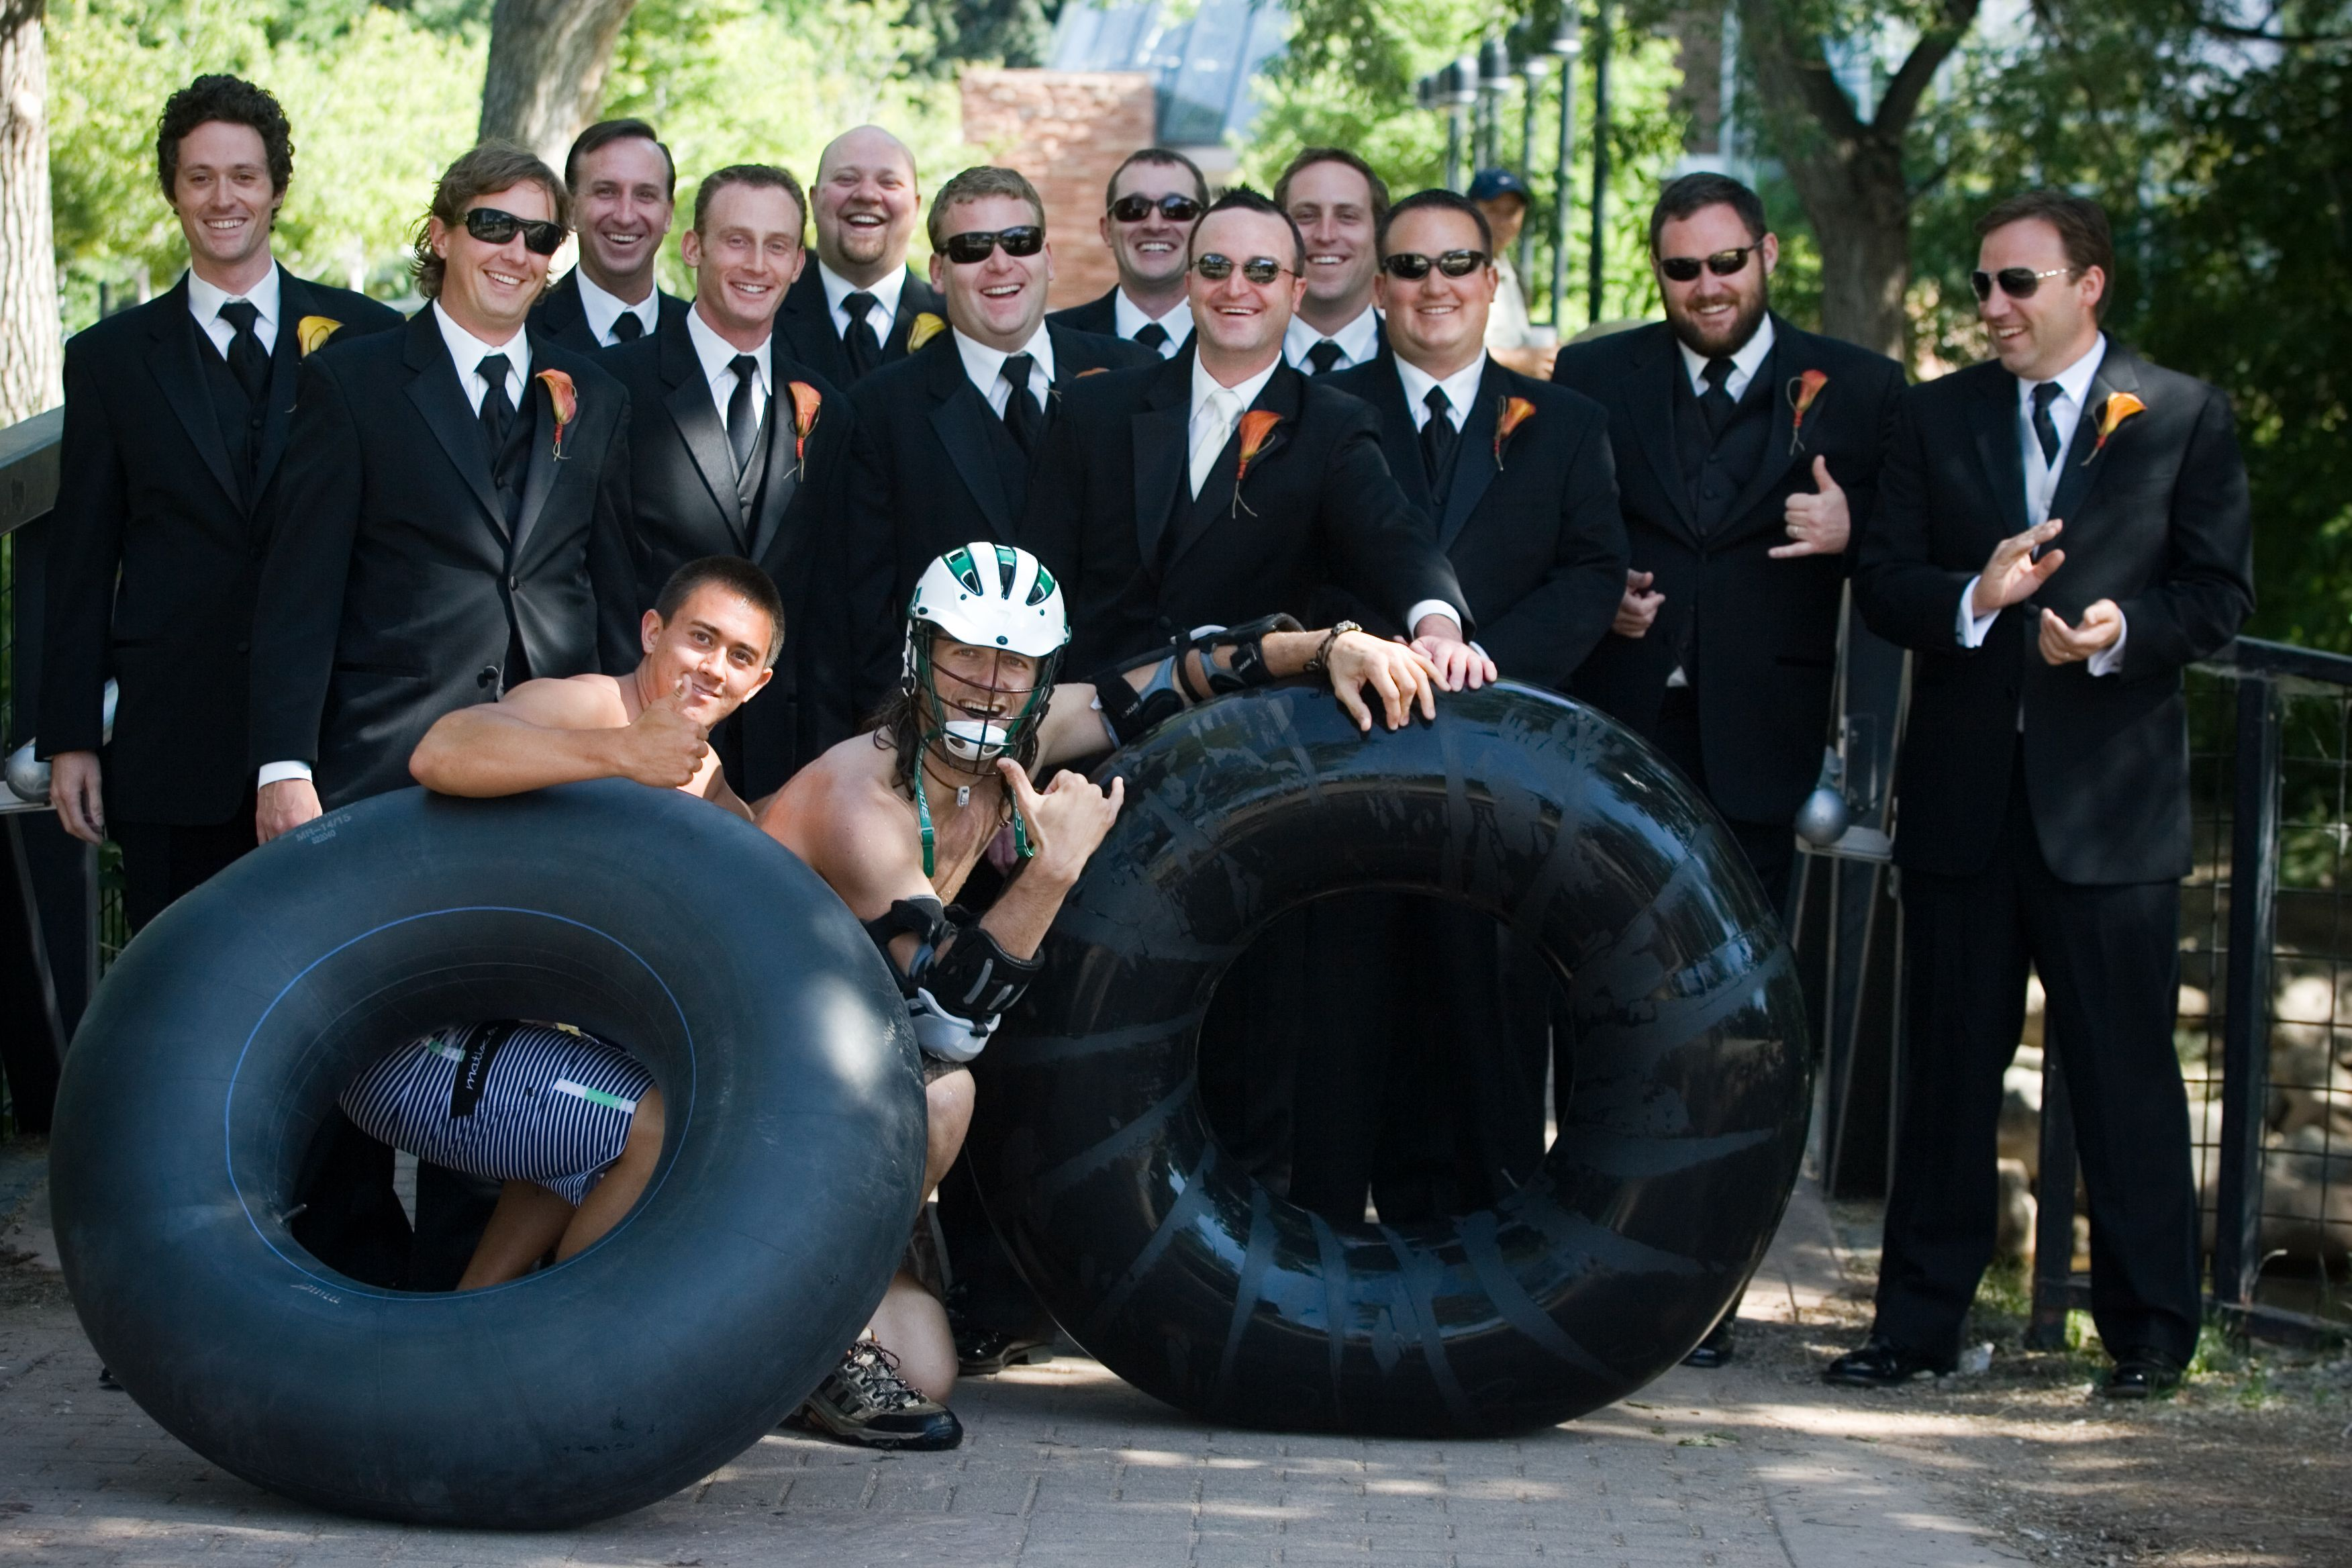 Groomsmen, Groom, Getting ready, Guys, Wedding photos, Custom weddings of colorado, Pre-wedding photos